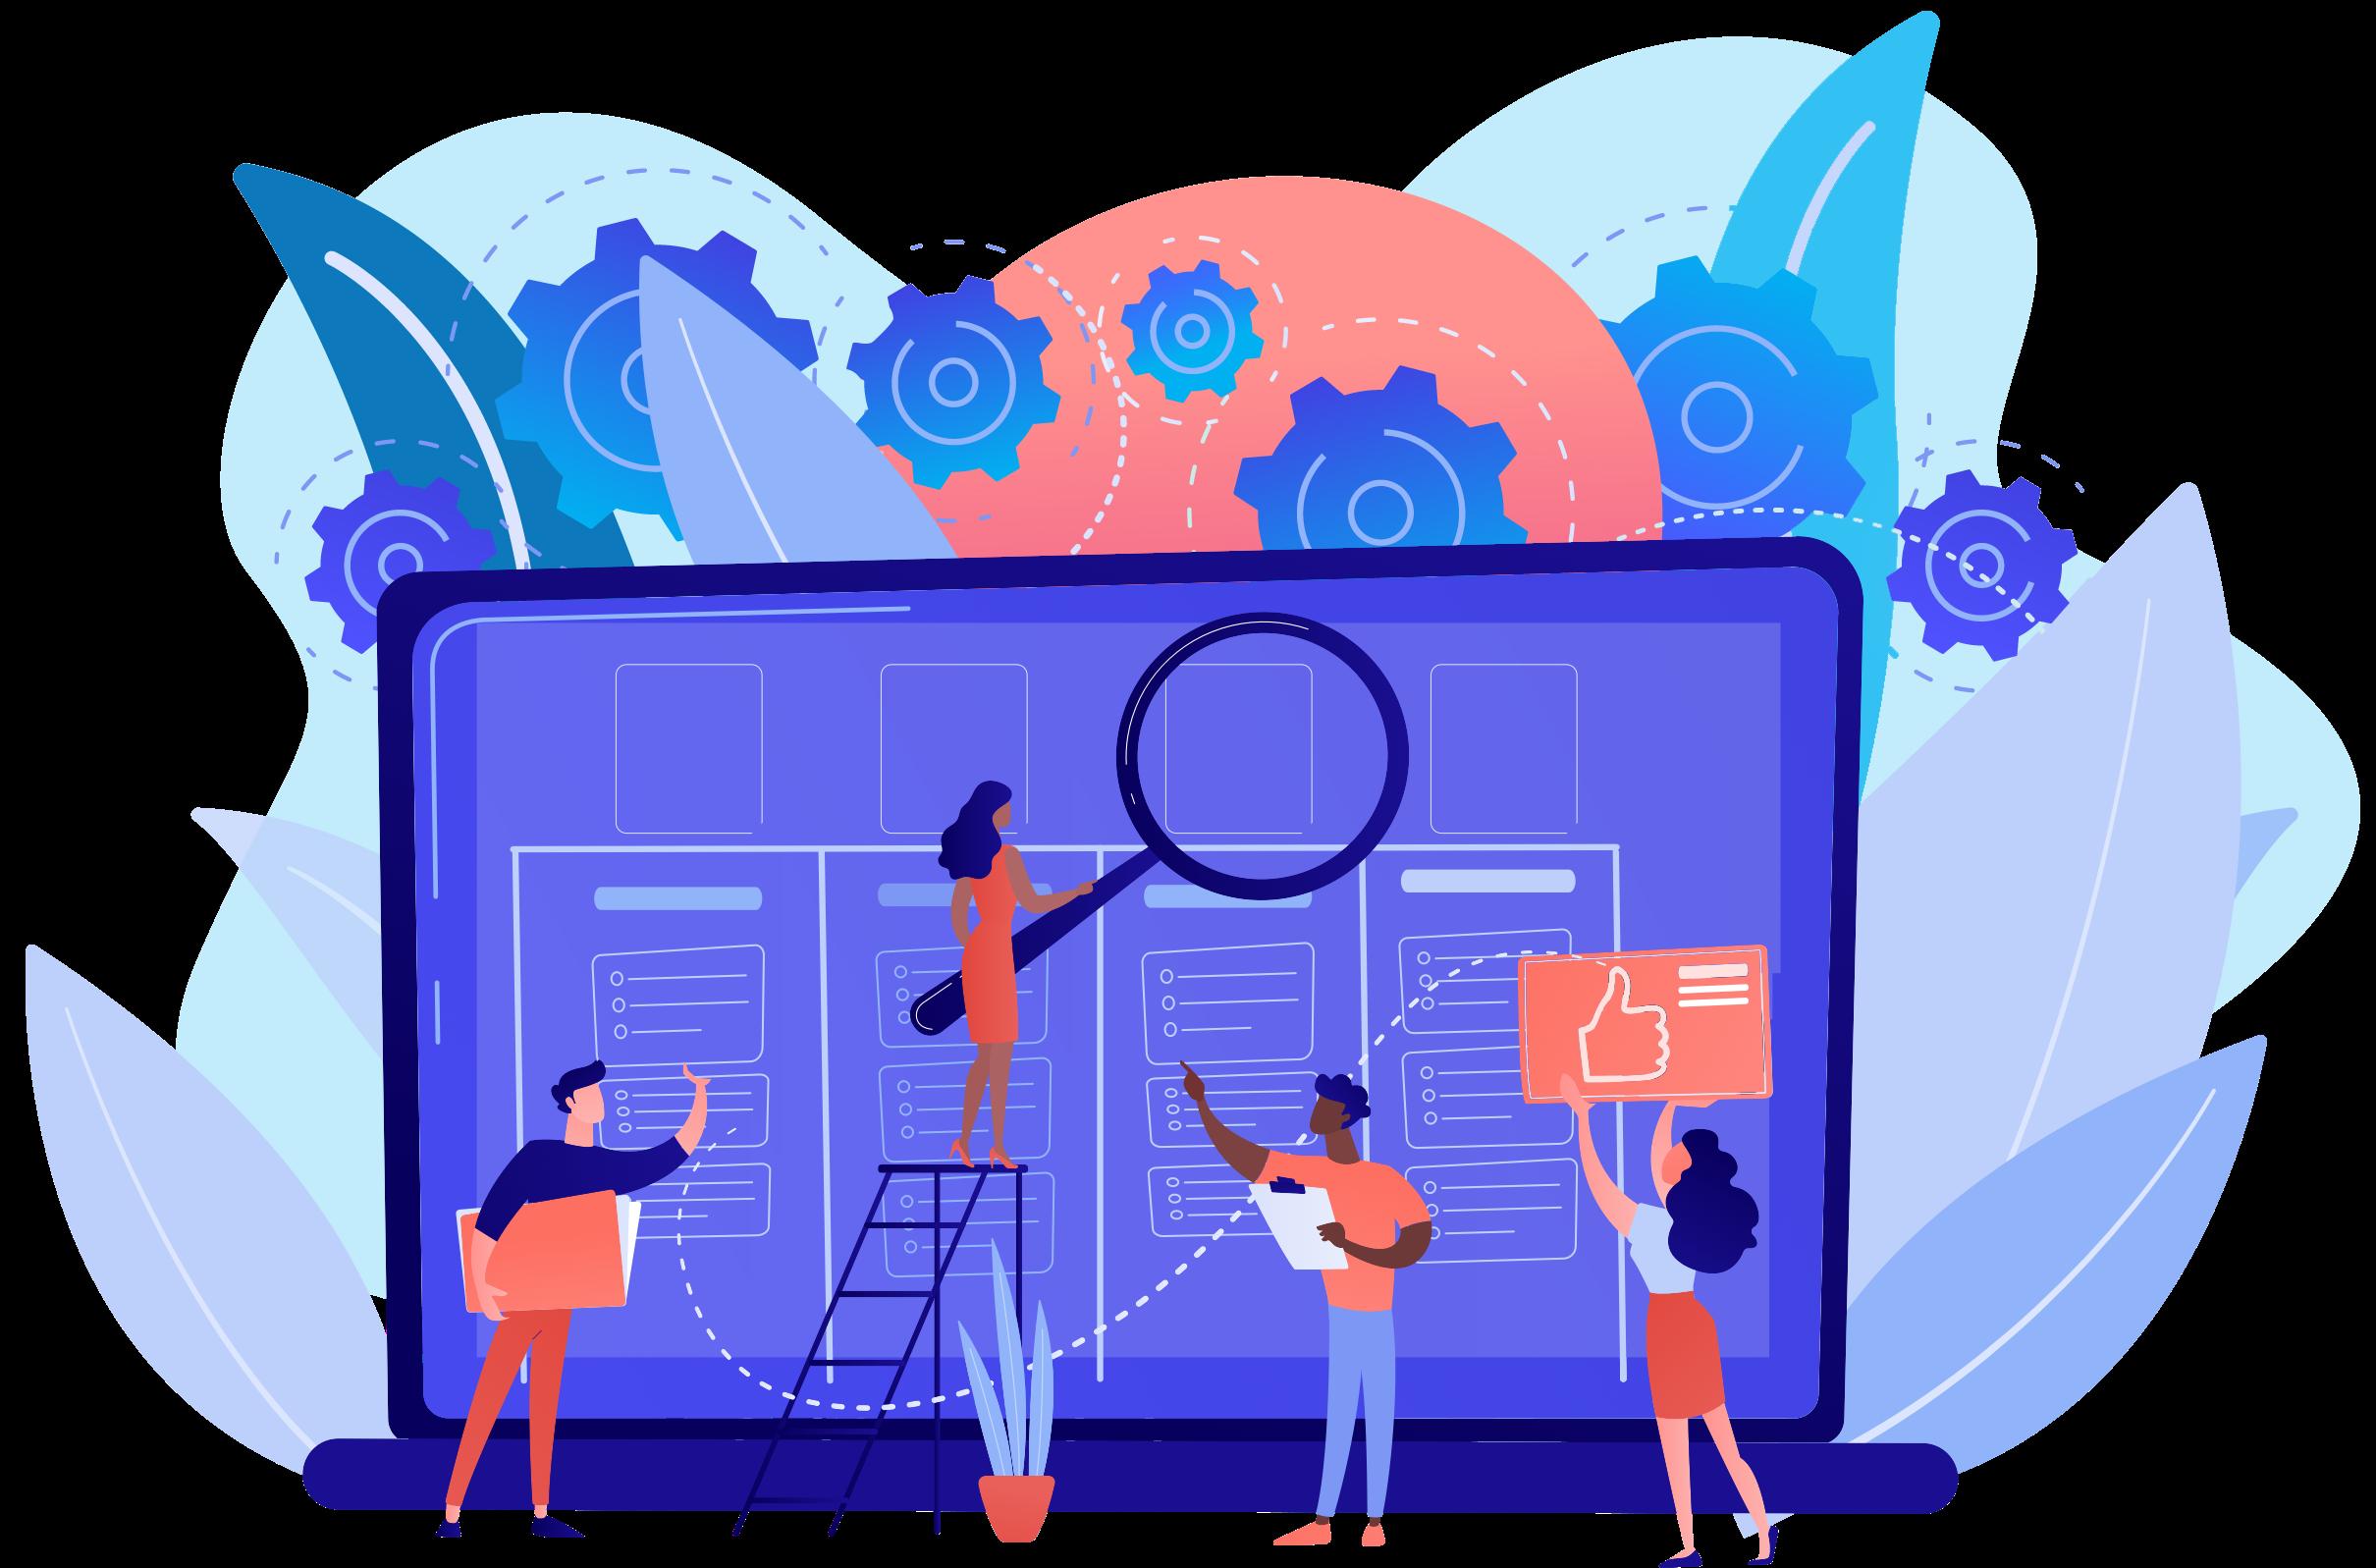 Social Edge community platform